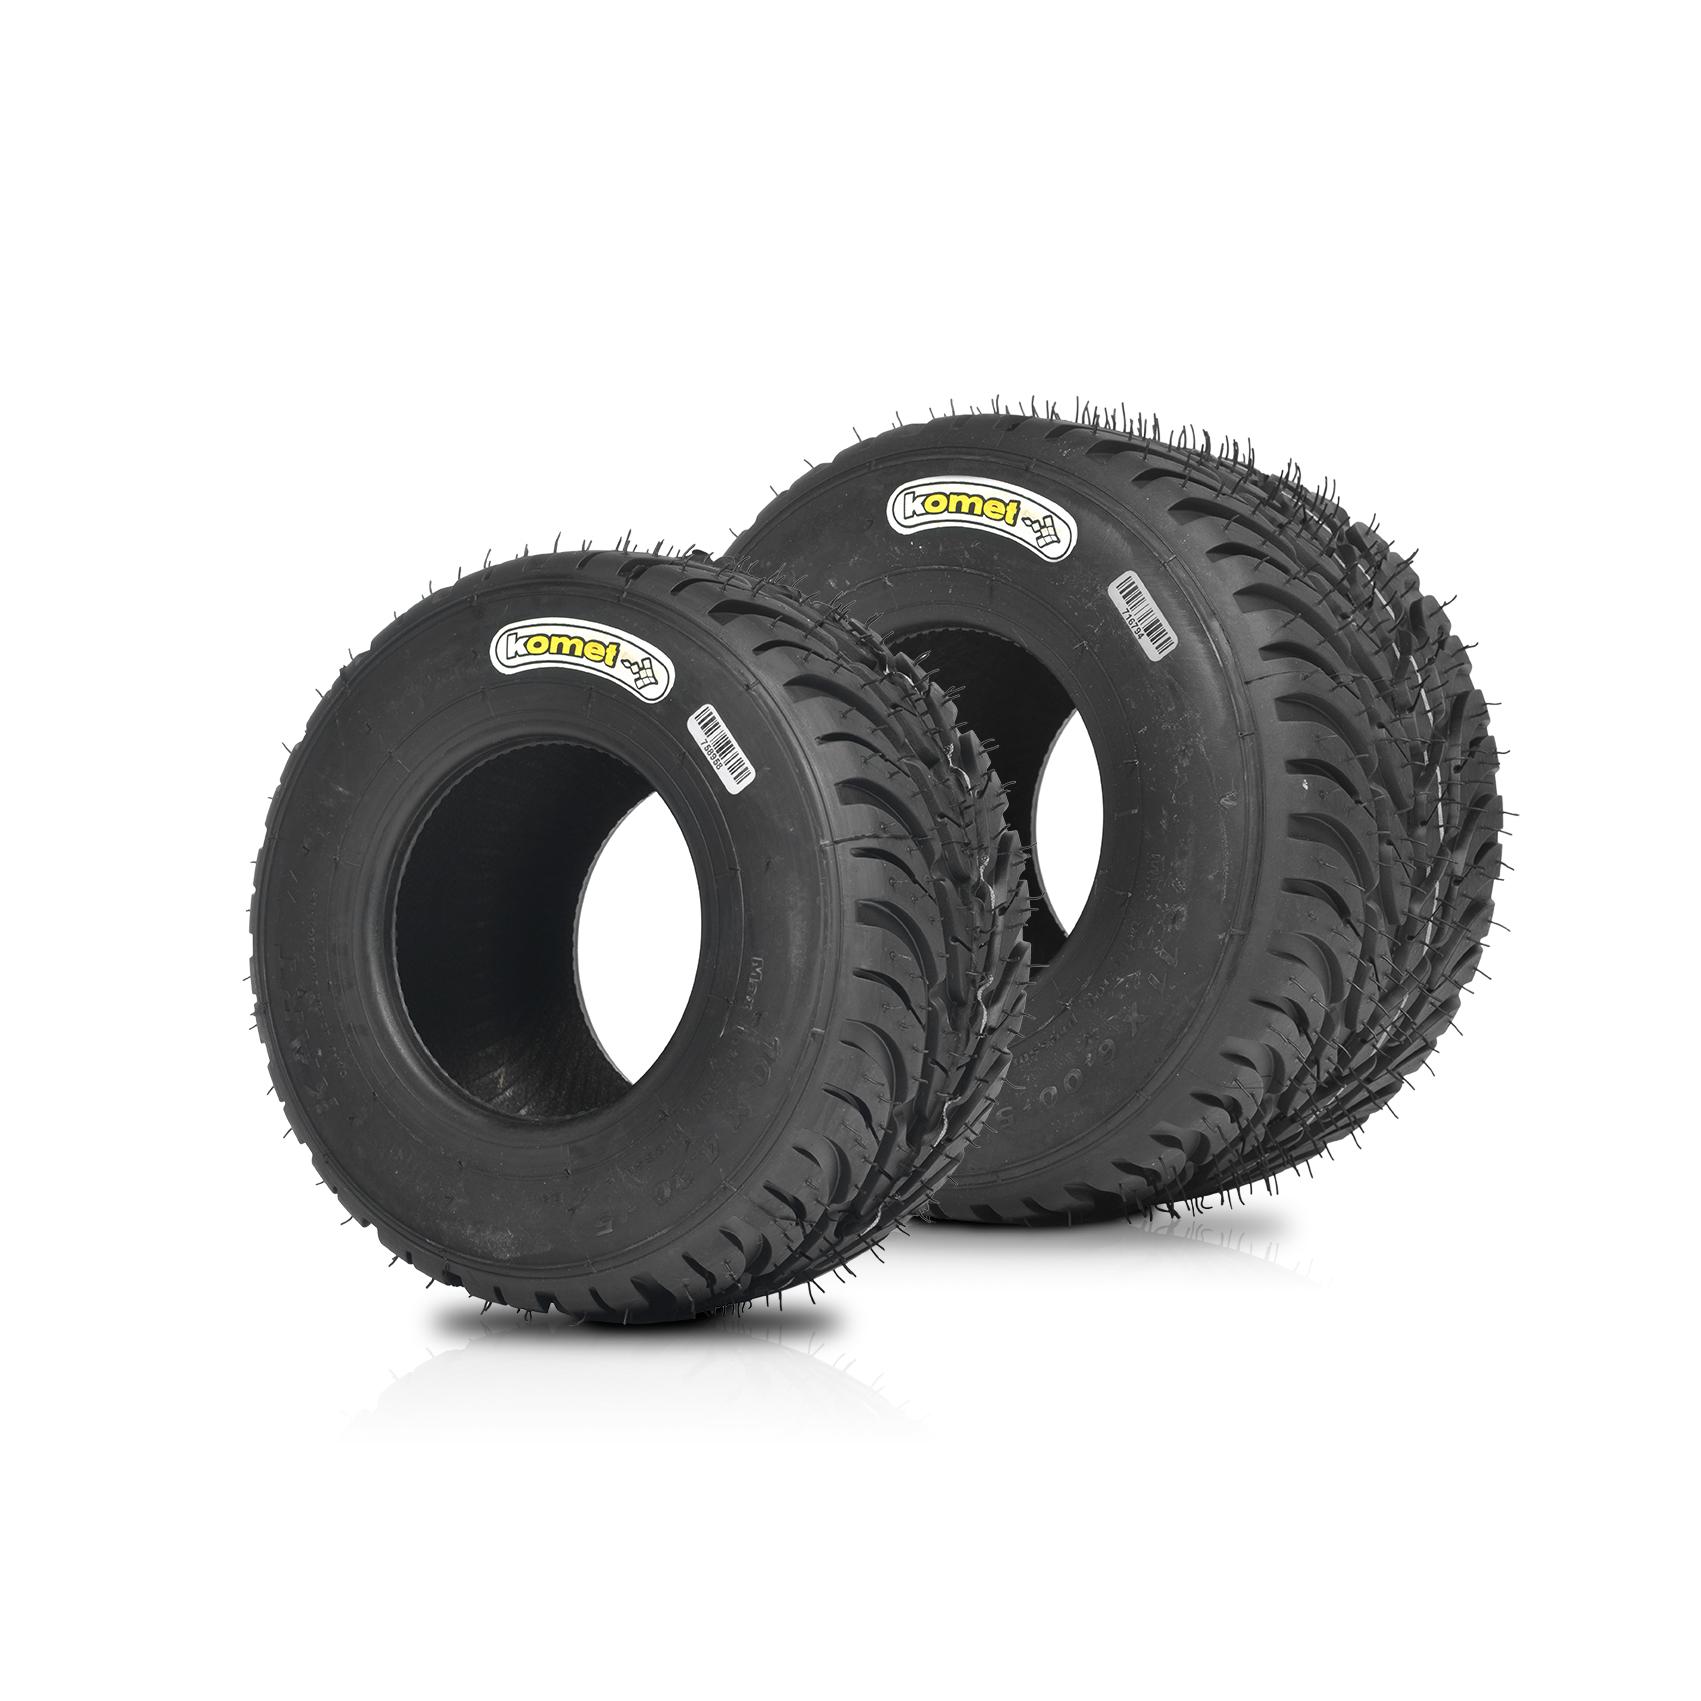 IAME KARTING | Komet Racing Tyres k1W